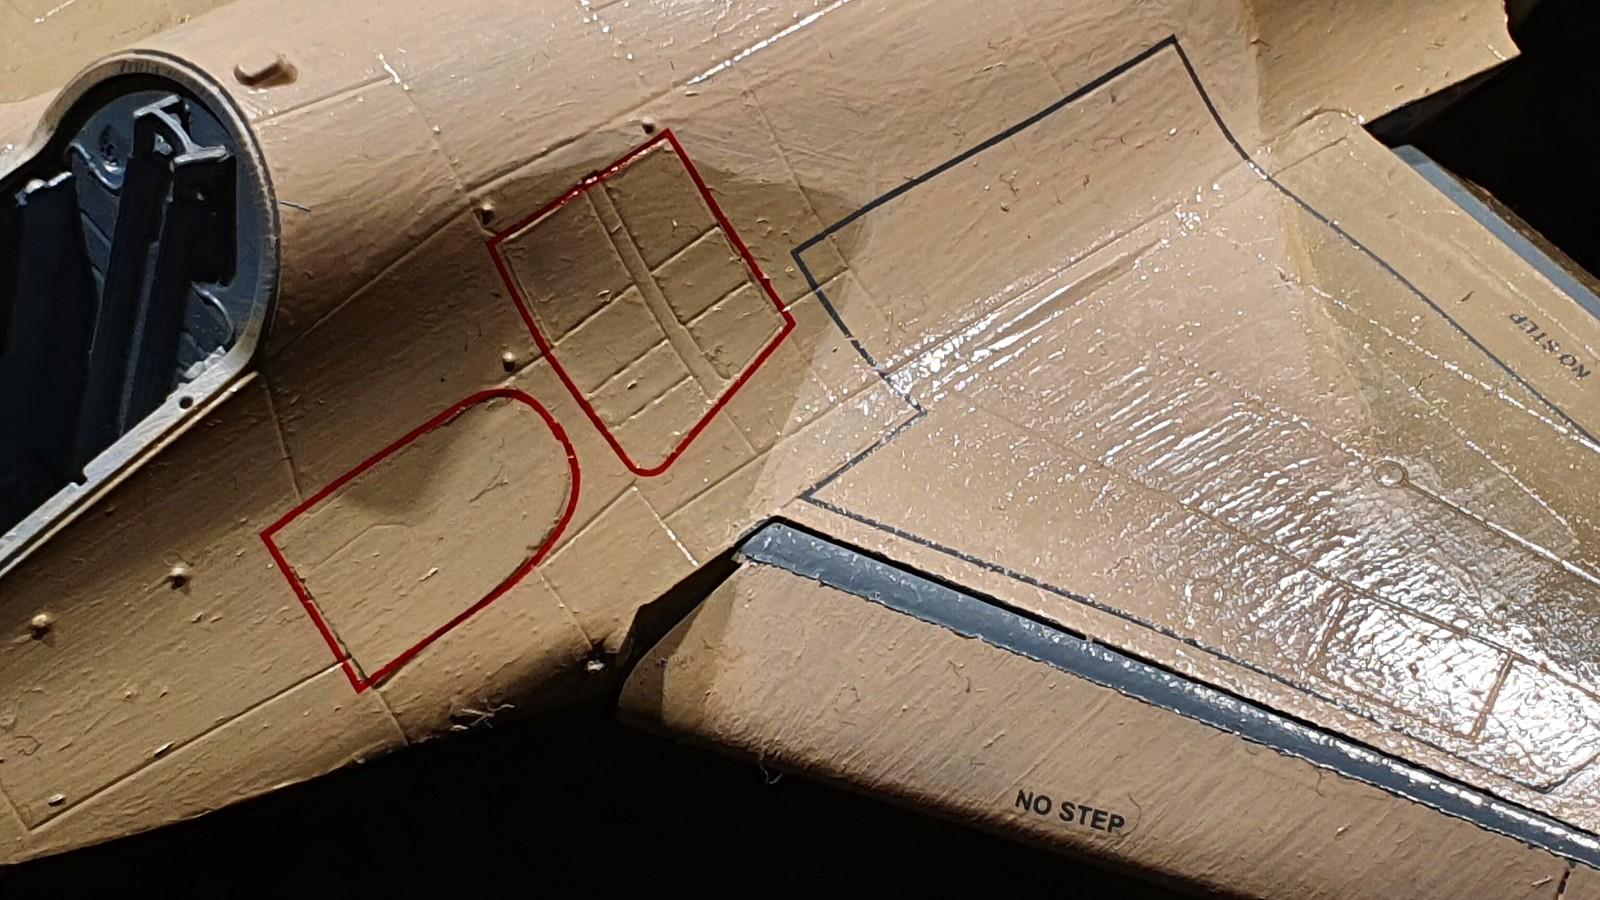 Numera två par tumvantar - Yak-130 Mitten - Zvezda 1/48 - Sida 8 48425333467_1da6401907_h